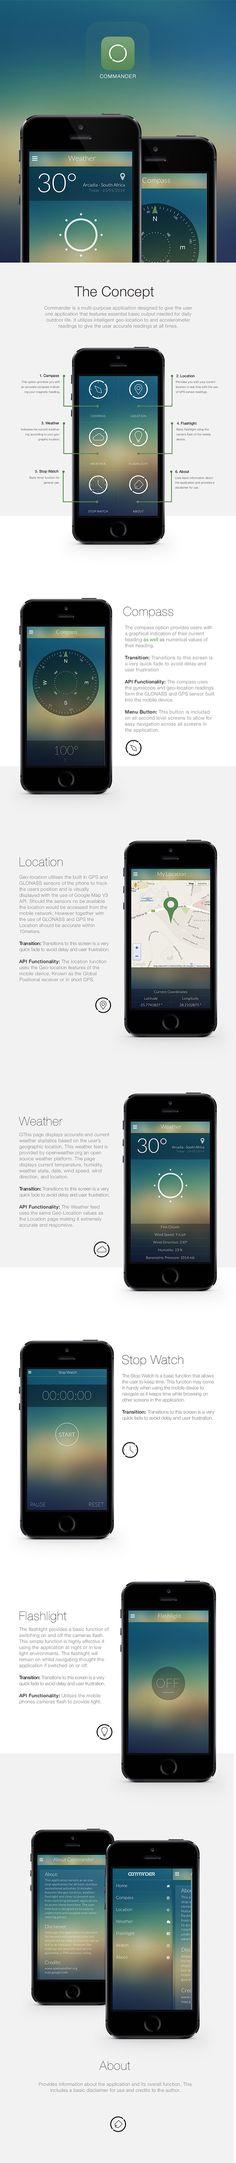 Commander App #commander #app #mobile #design #ui #ux